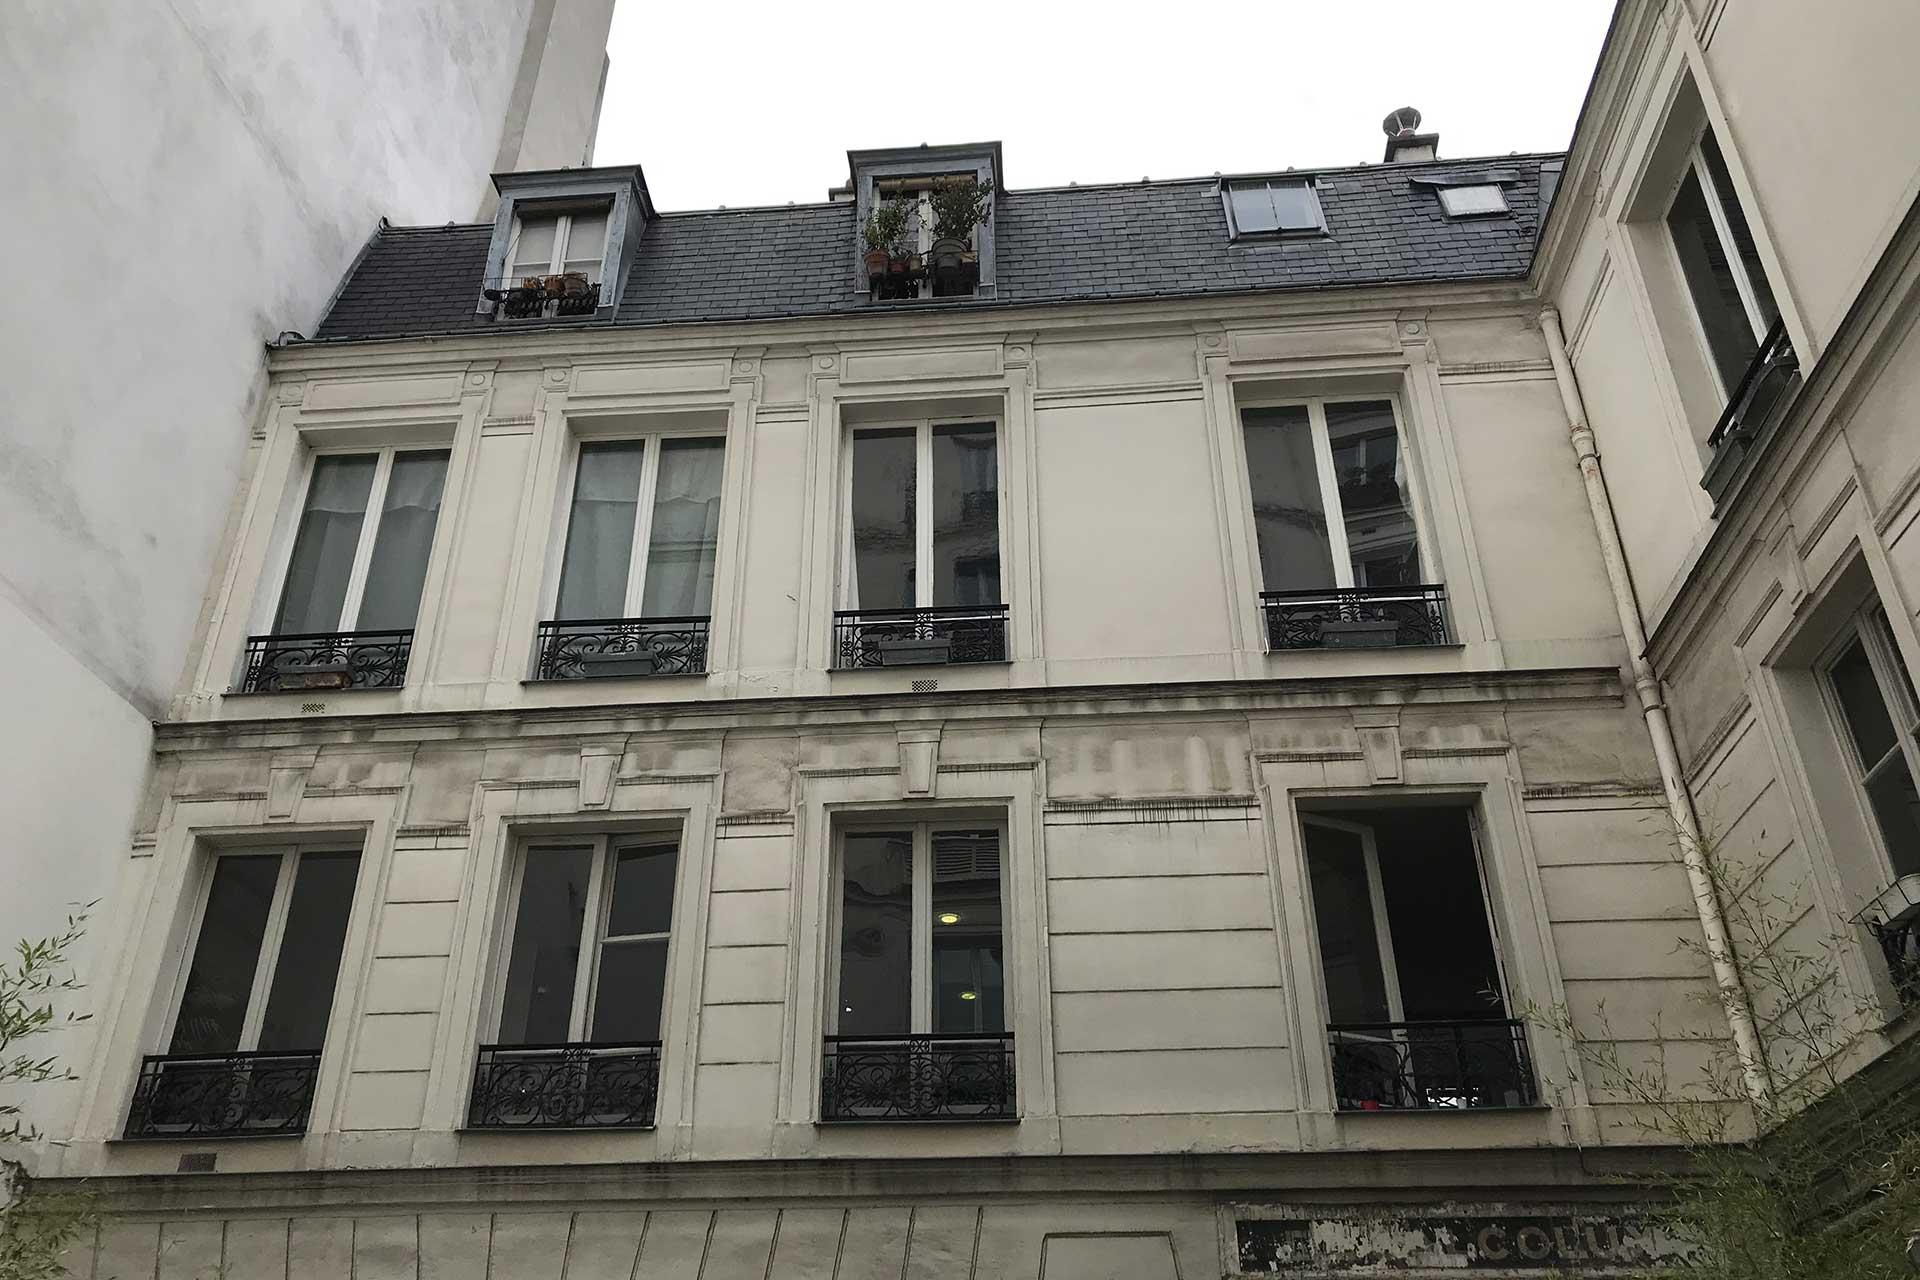 16 rue oberkampf 75011 paris